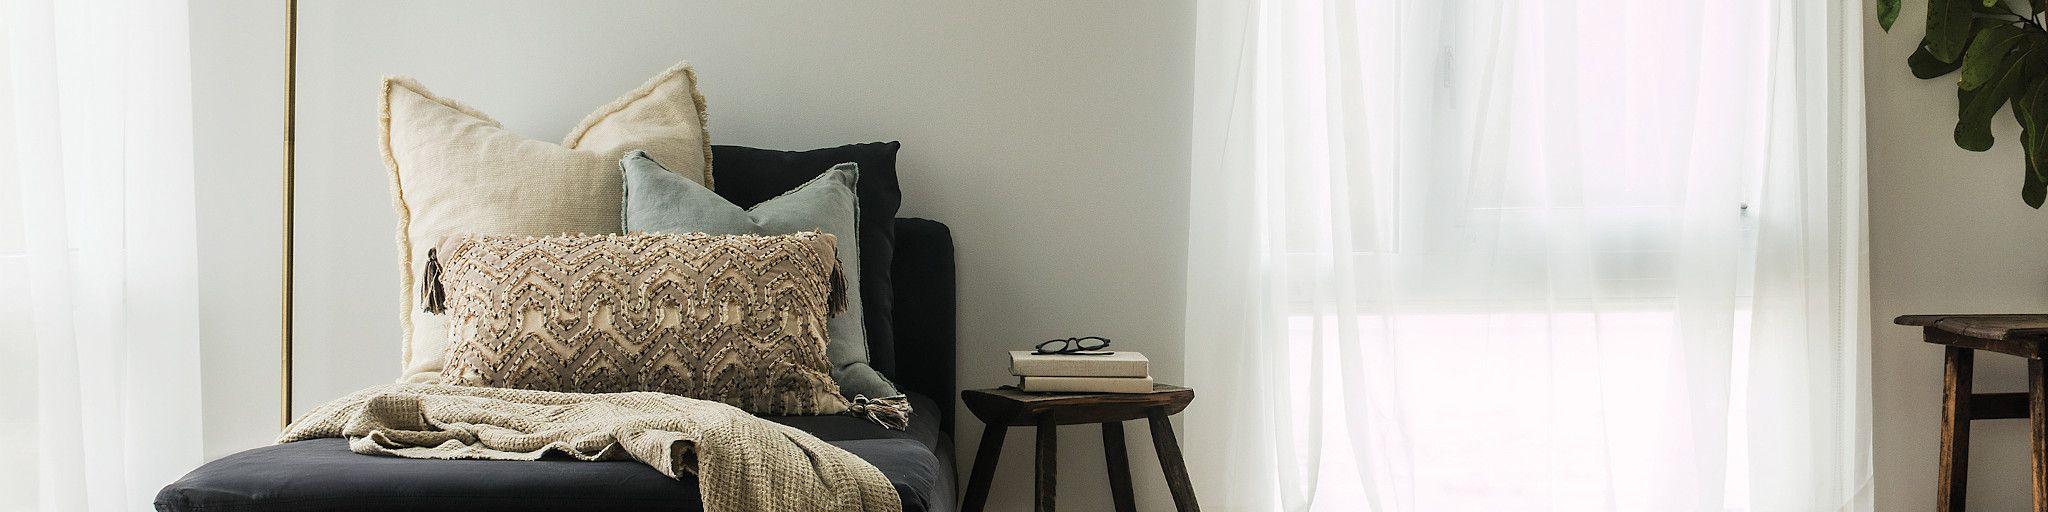 Hardwood-Anderson-Tuftex-9U169_11054-bedroom-2020